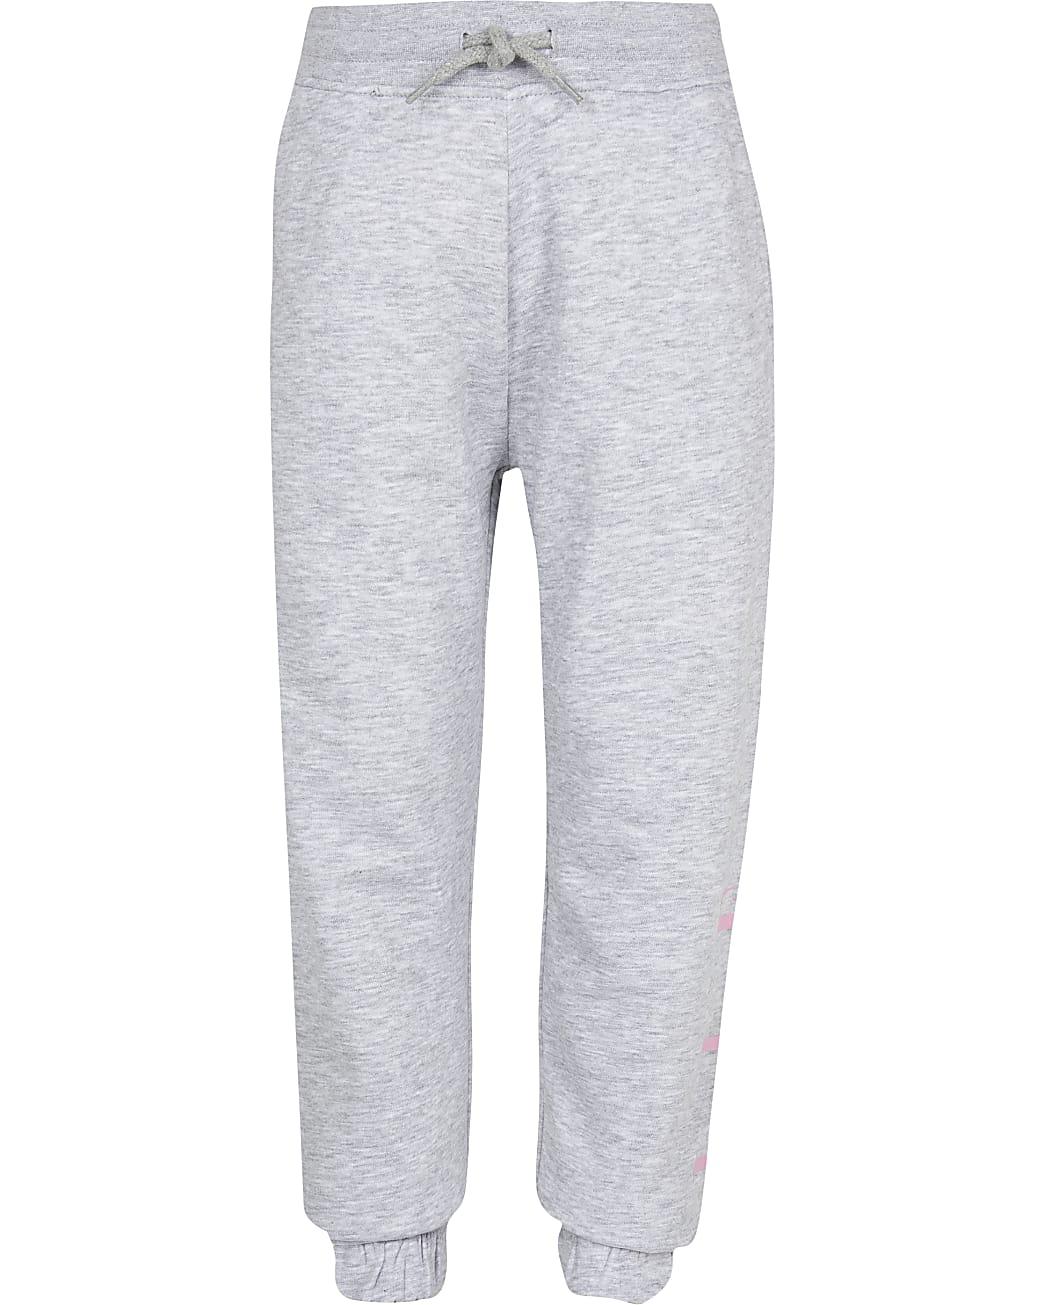 Girls ELLE grey joggers